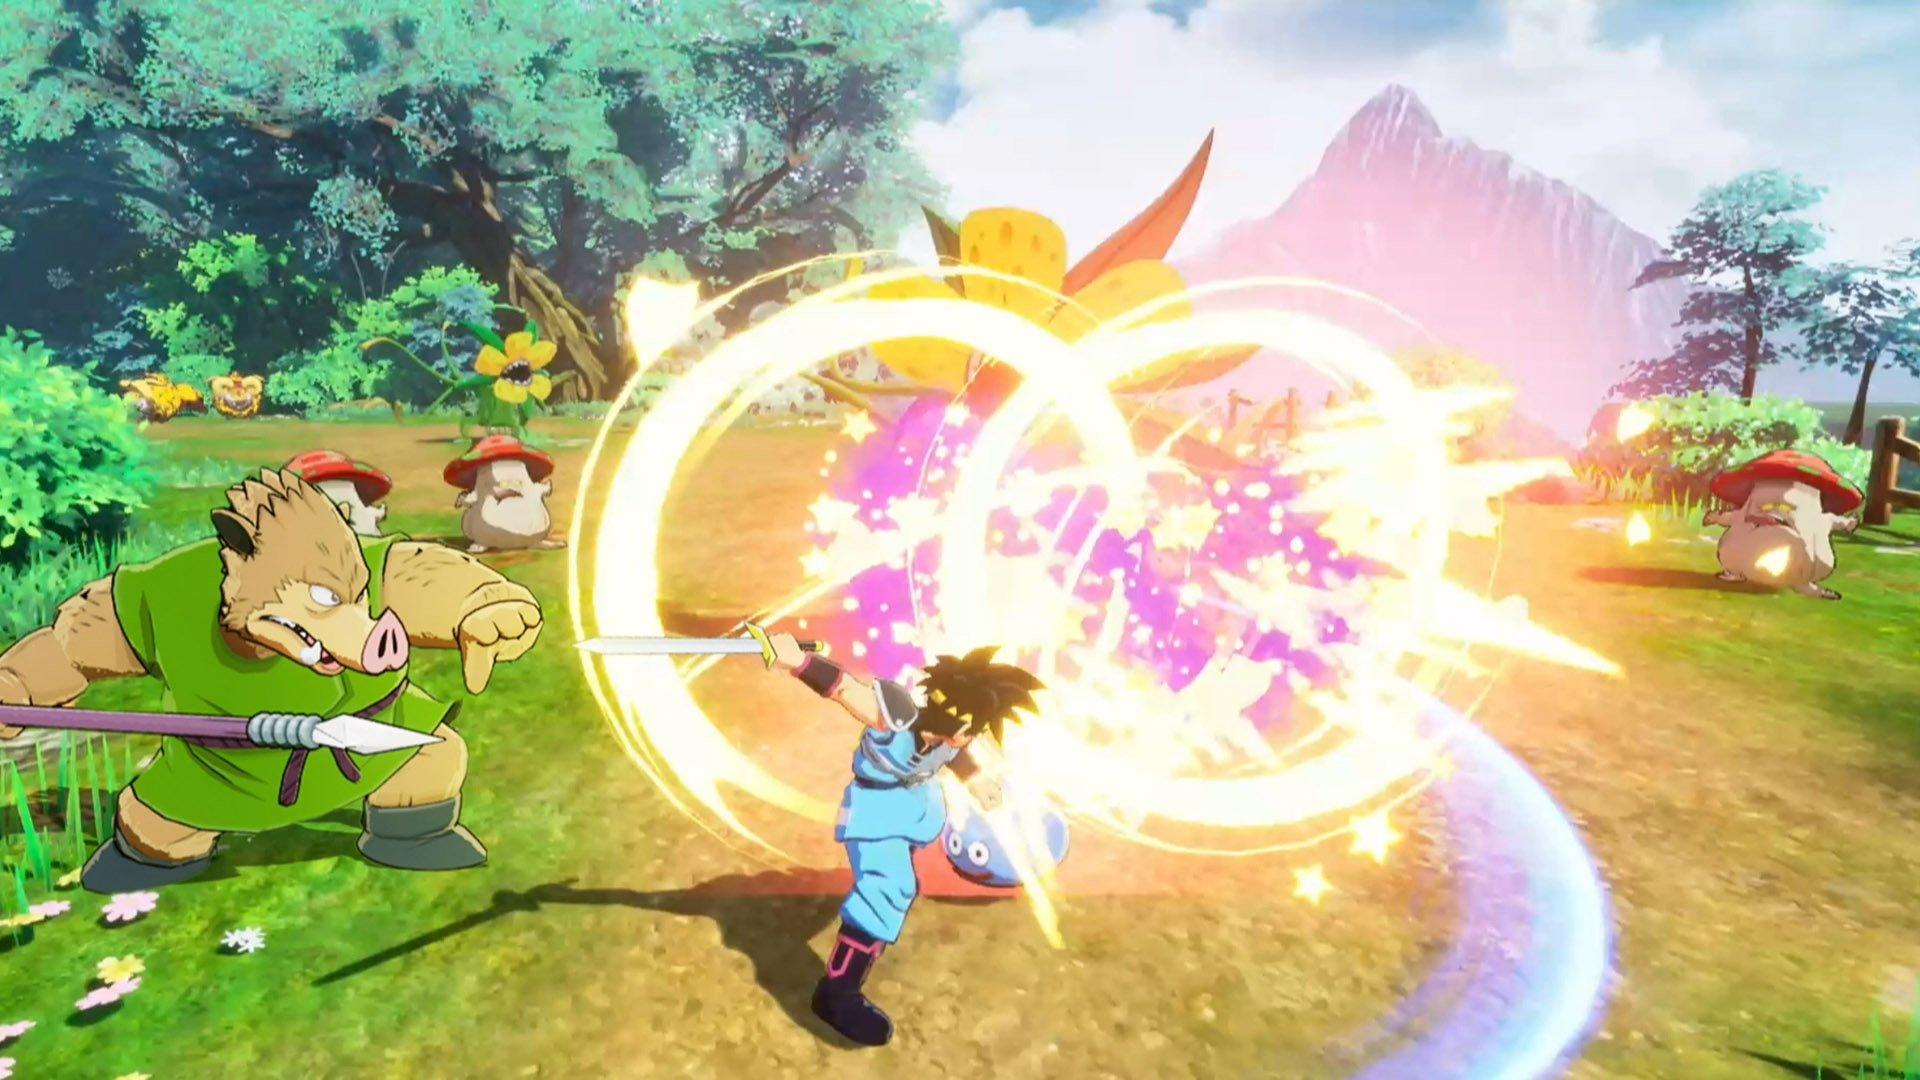 Infinity Strash - Dragon Quest: The Adventure of Dai